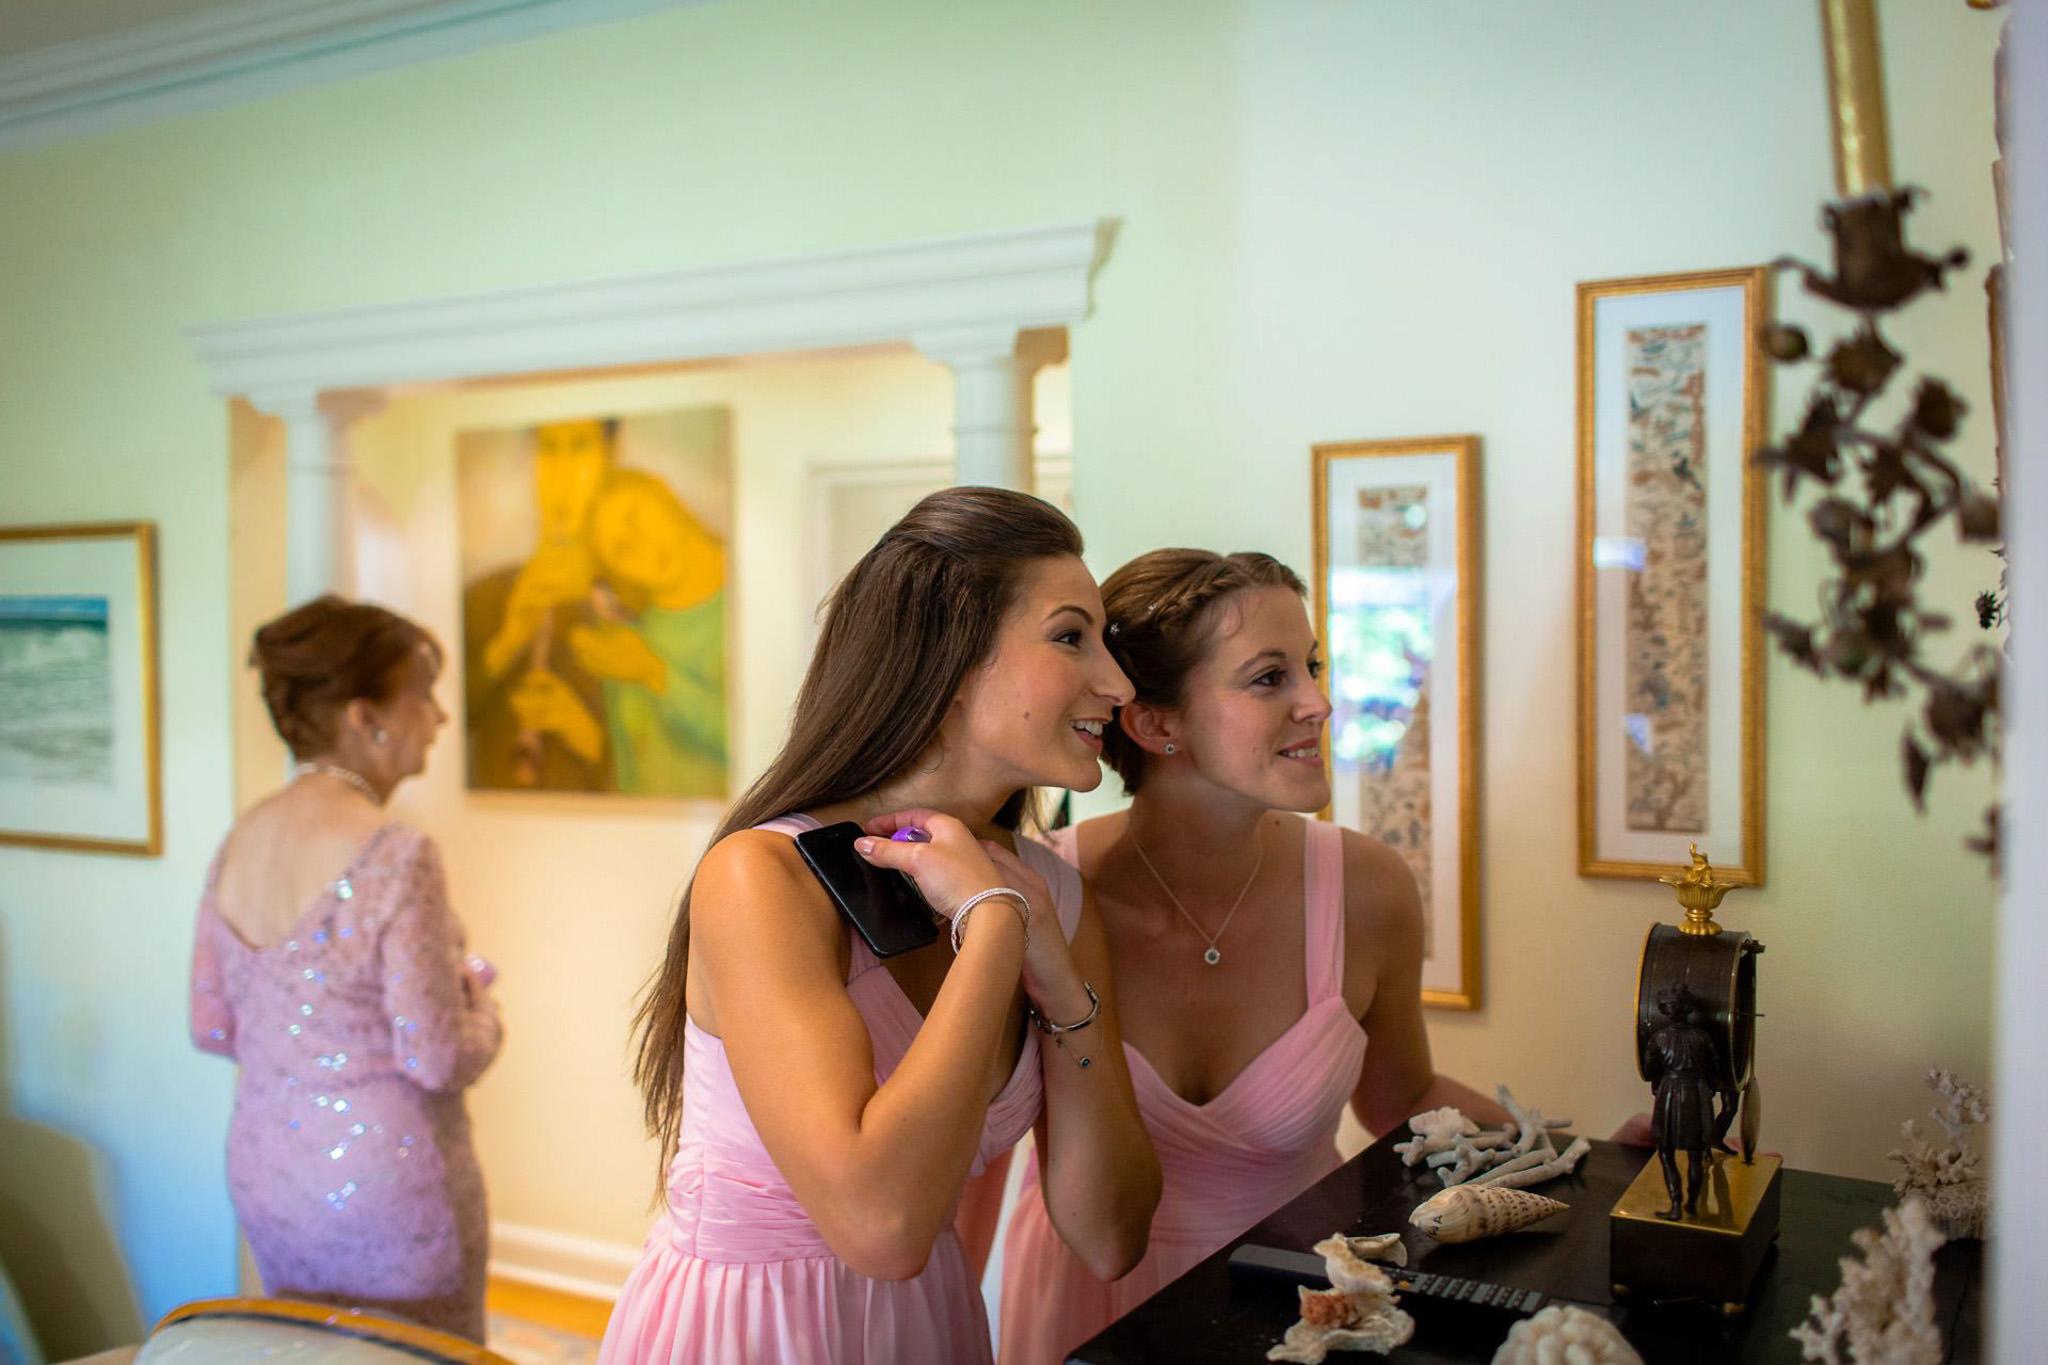 St. Pancras Renaissance hotel wedding bridesmaids looking in the mirror